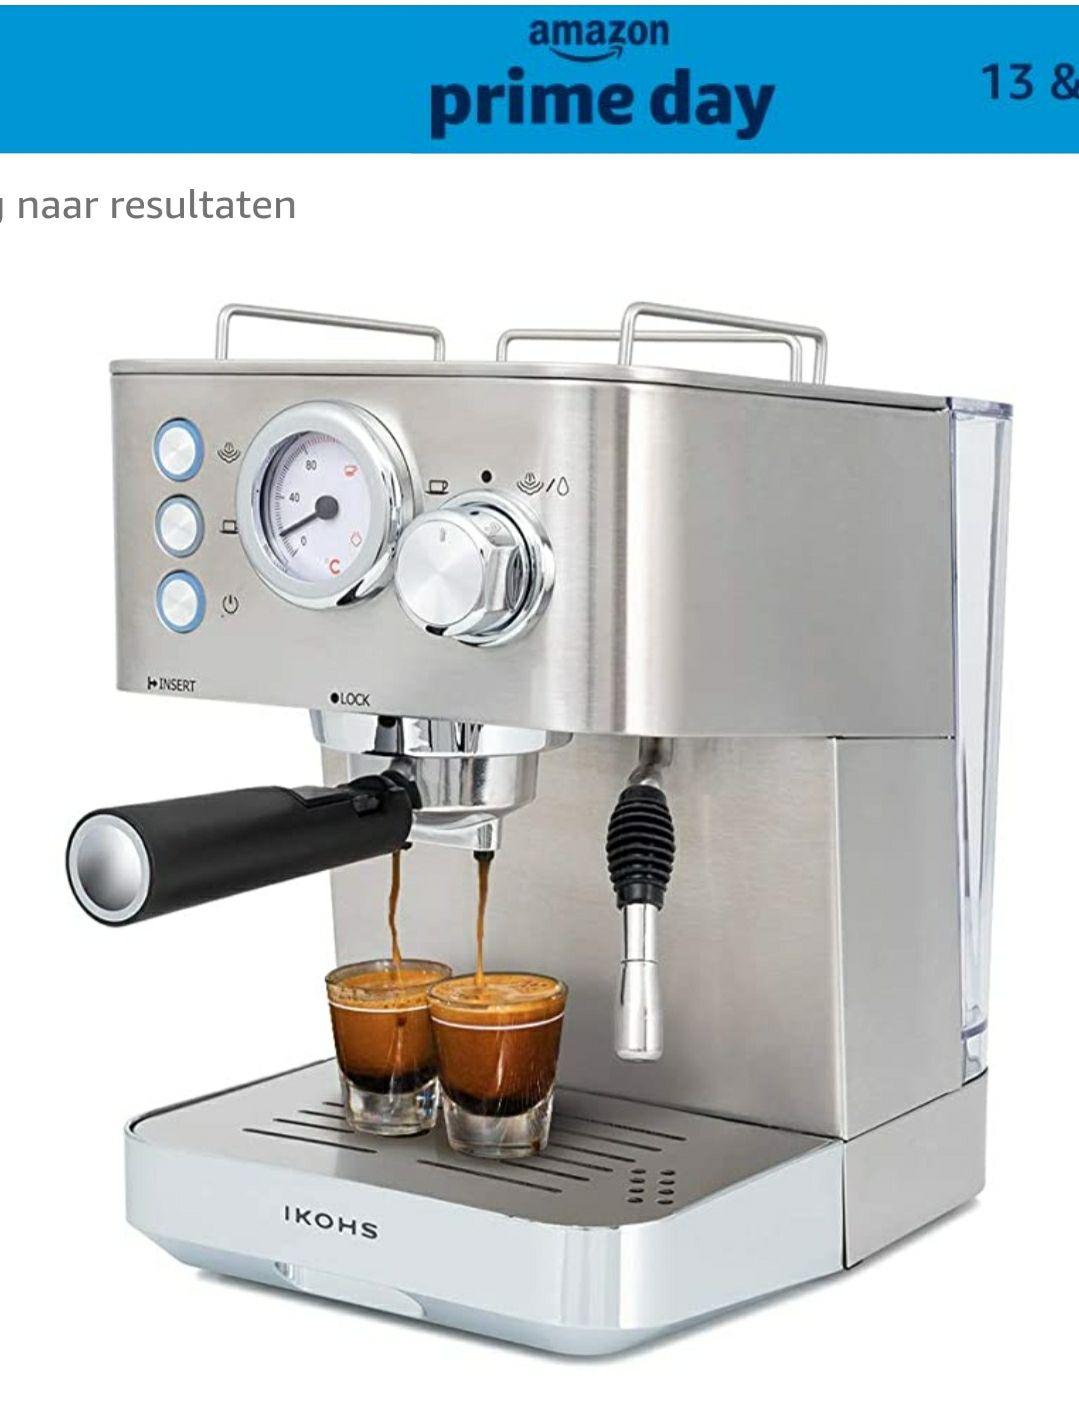 (Prime deal) IKOHS Koffie Esprit elektrisch koffiezetapparaat